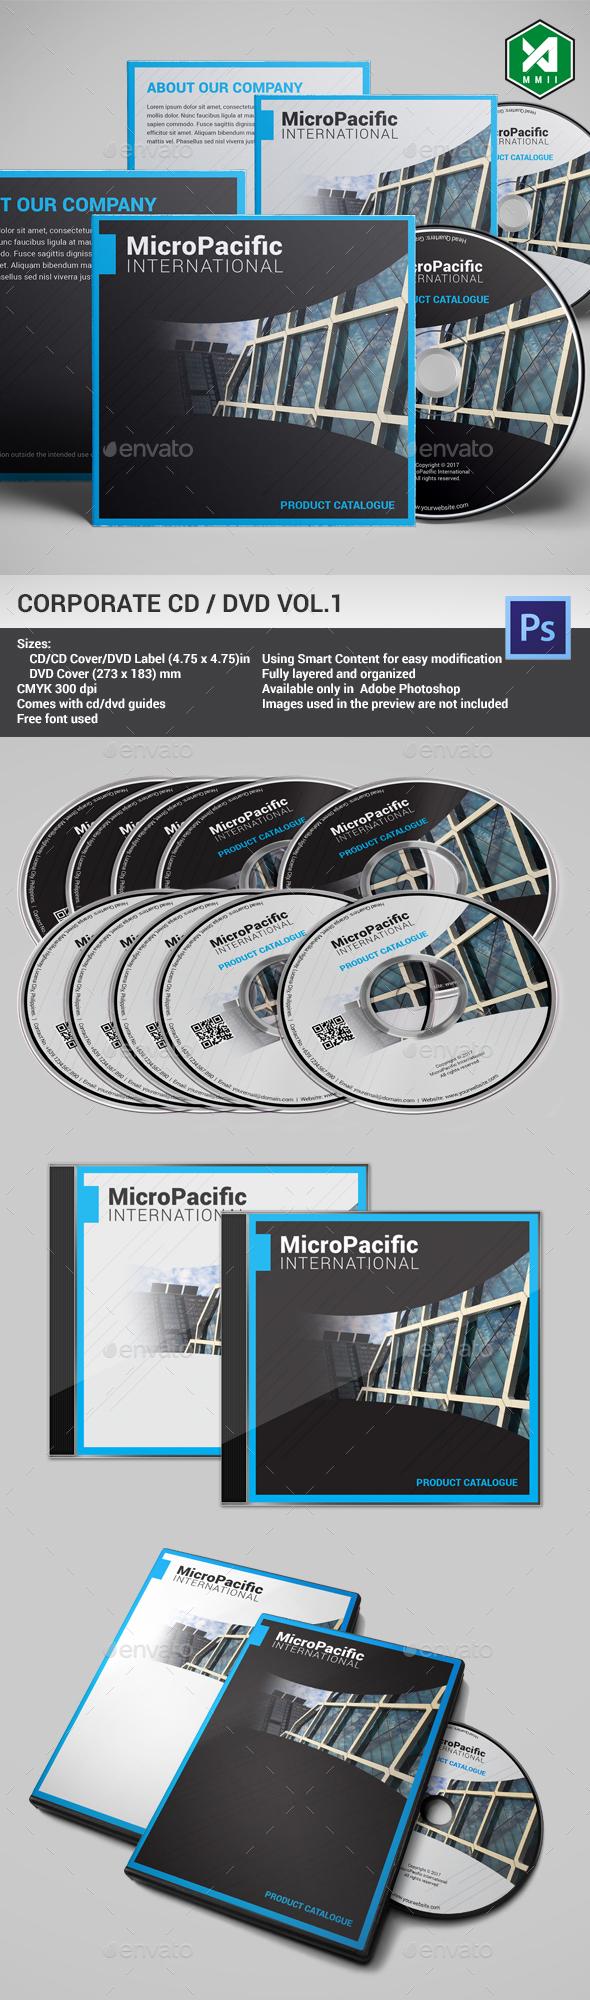 Corporate CD / DVD Template Vol. 1 - CD & DVD Artwork Print Templates